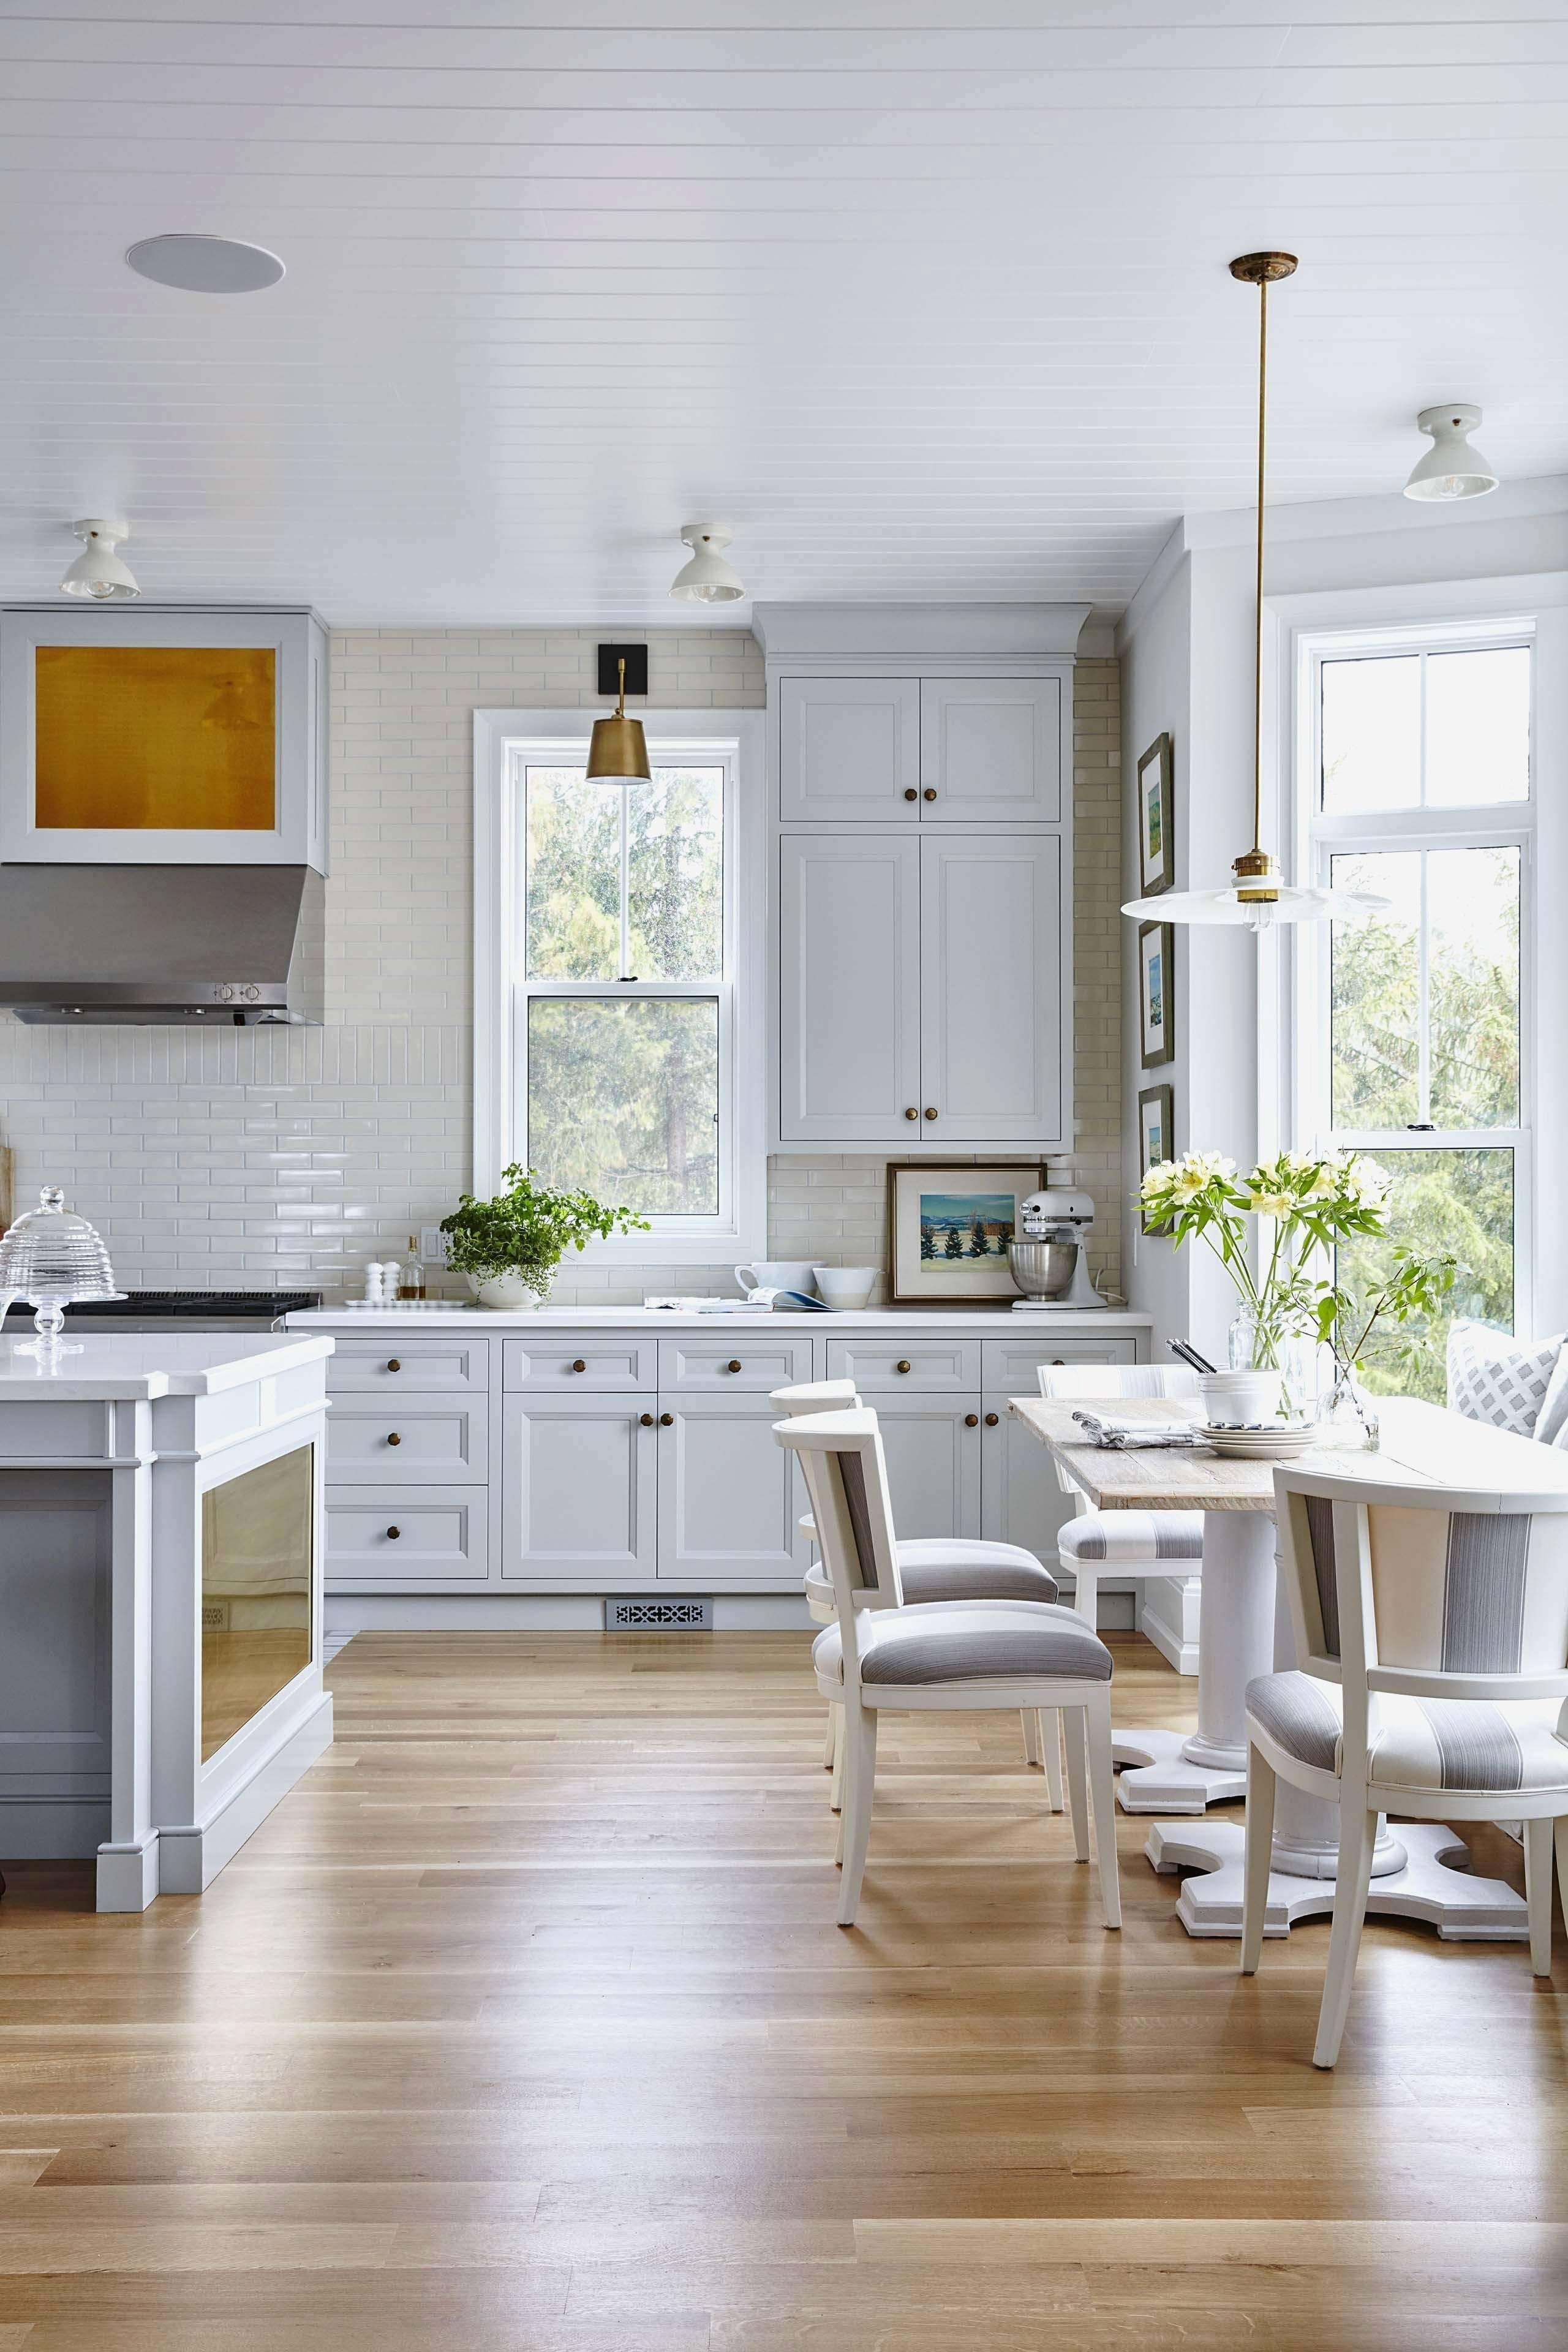 houzz hardwood flooring ideas of fair houzz kitchen designs or fresh gray living room houzz ngajari within exquisite houzz kitchen designs with kitchen joys kitchen joys kitchen 0d kitch